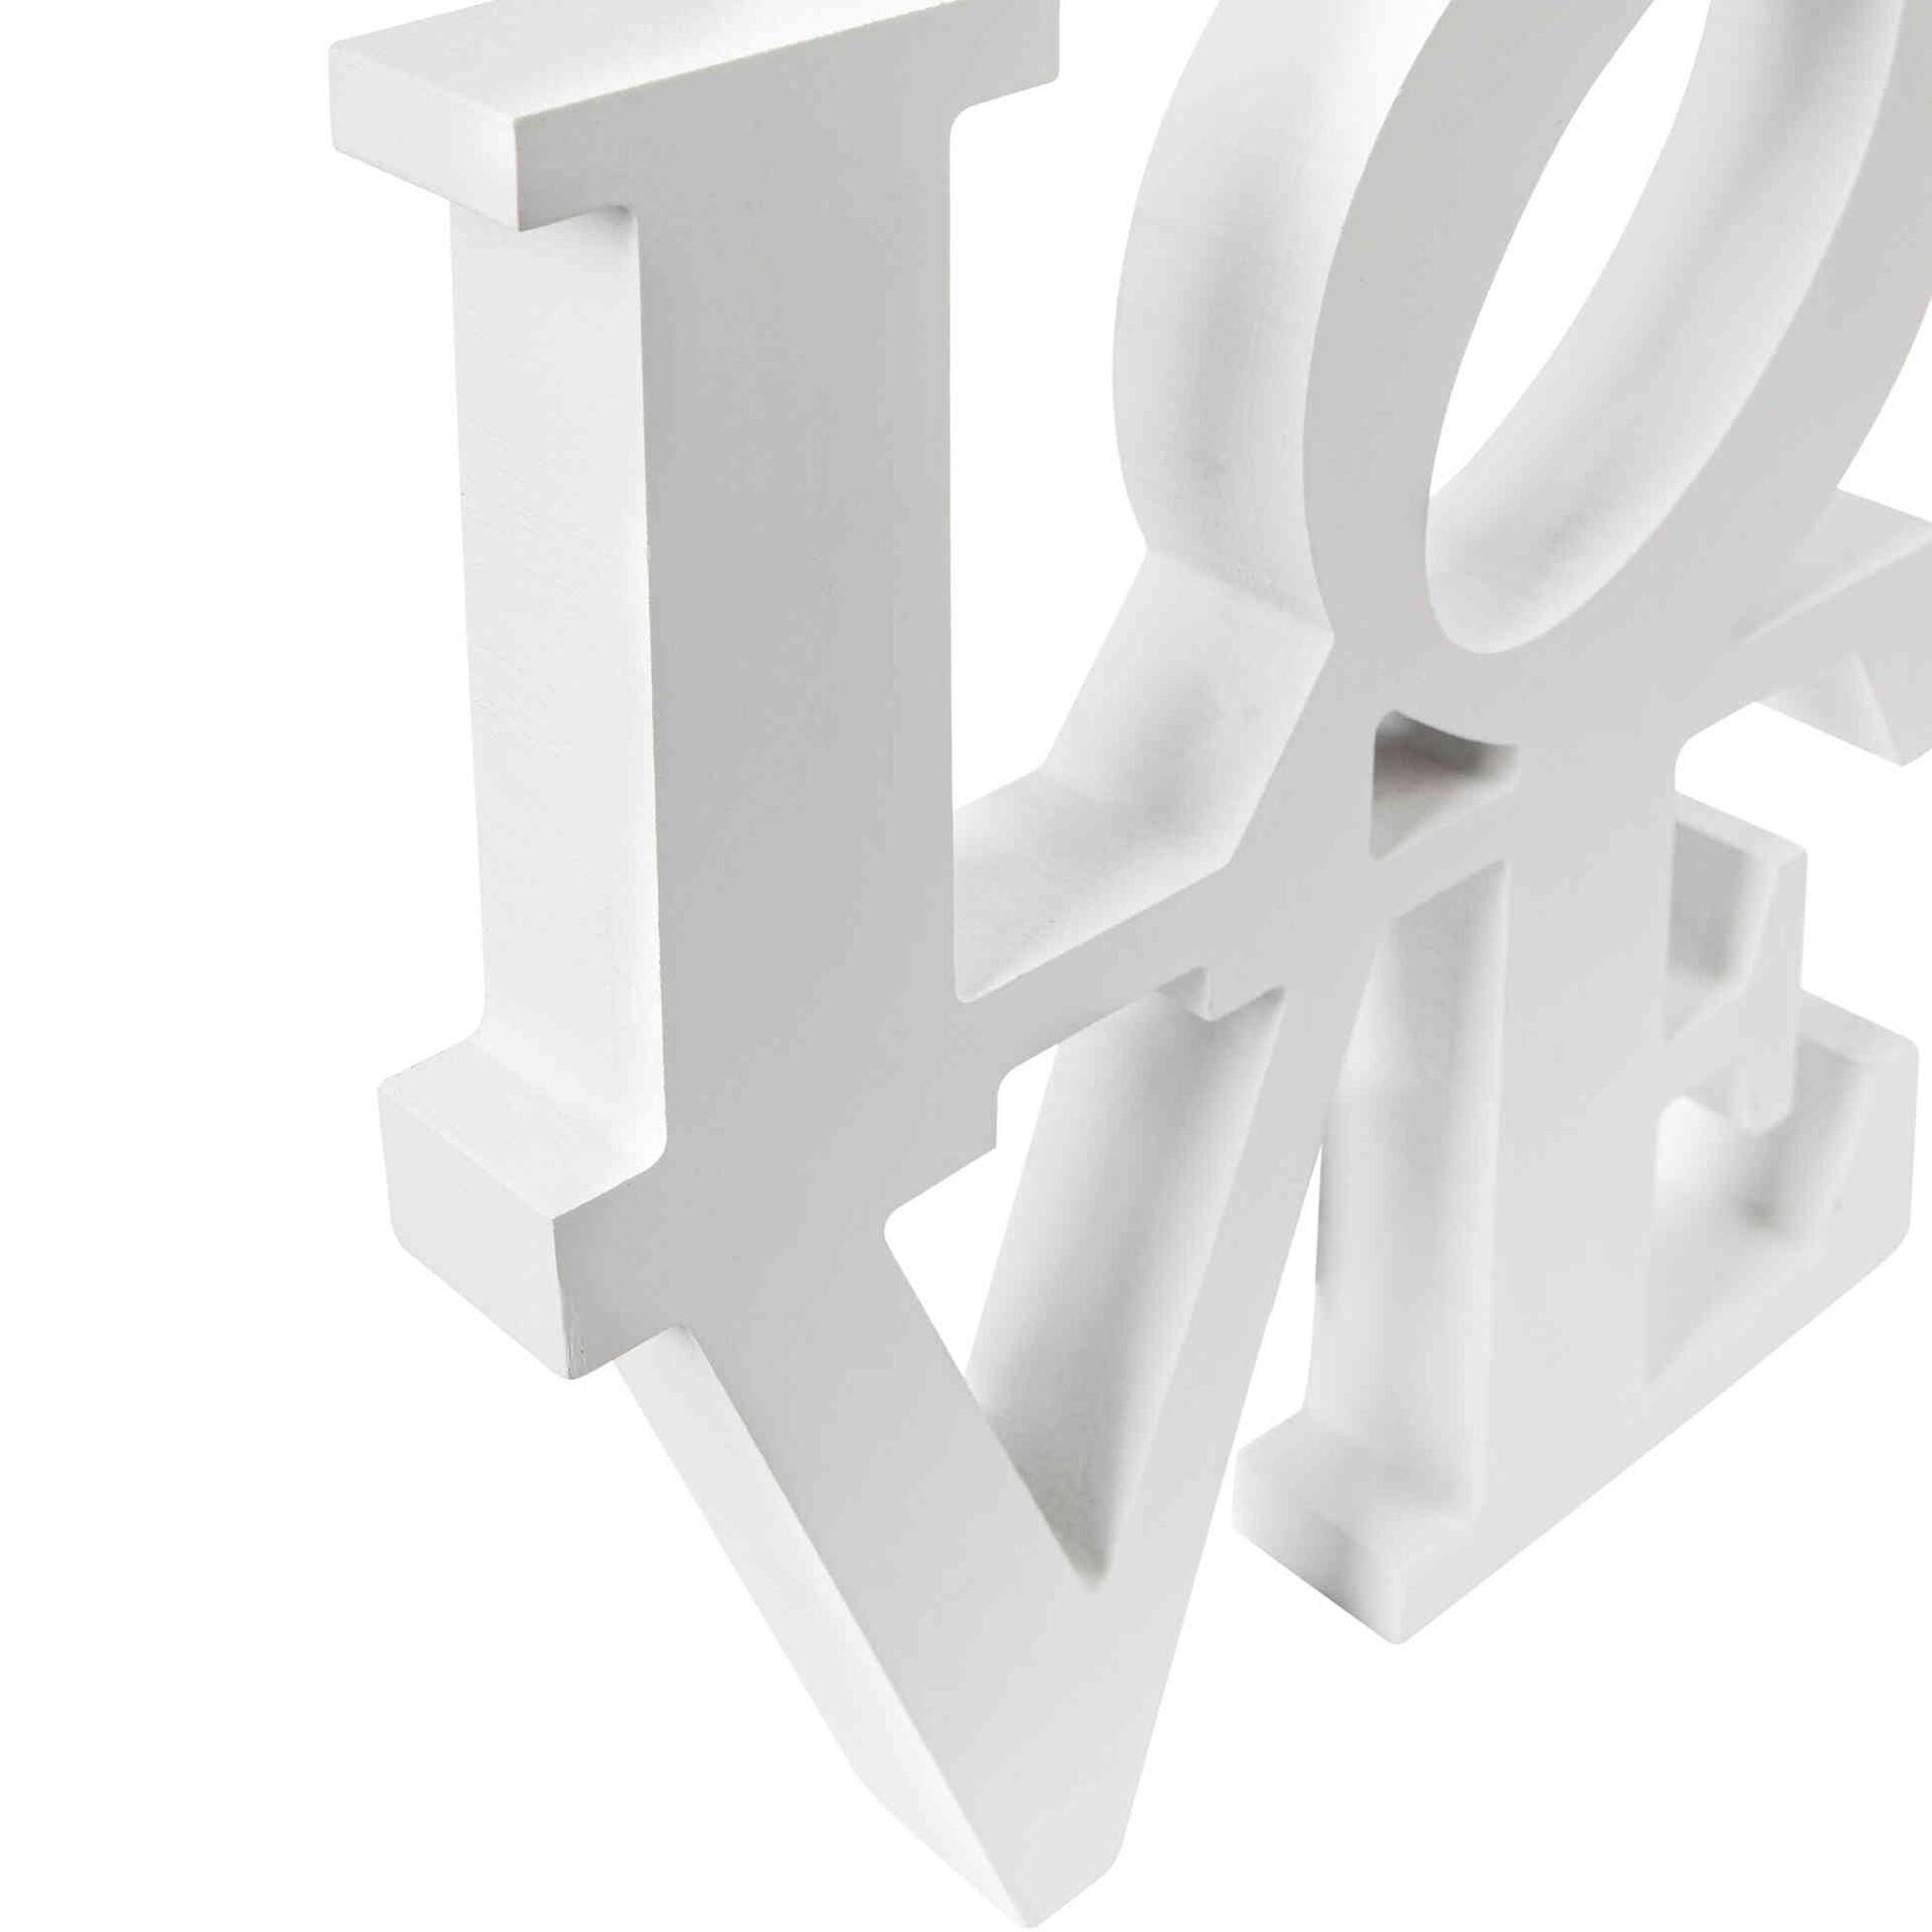 Letras Love Verticais Madeira 25x22cm Brancas